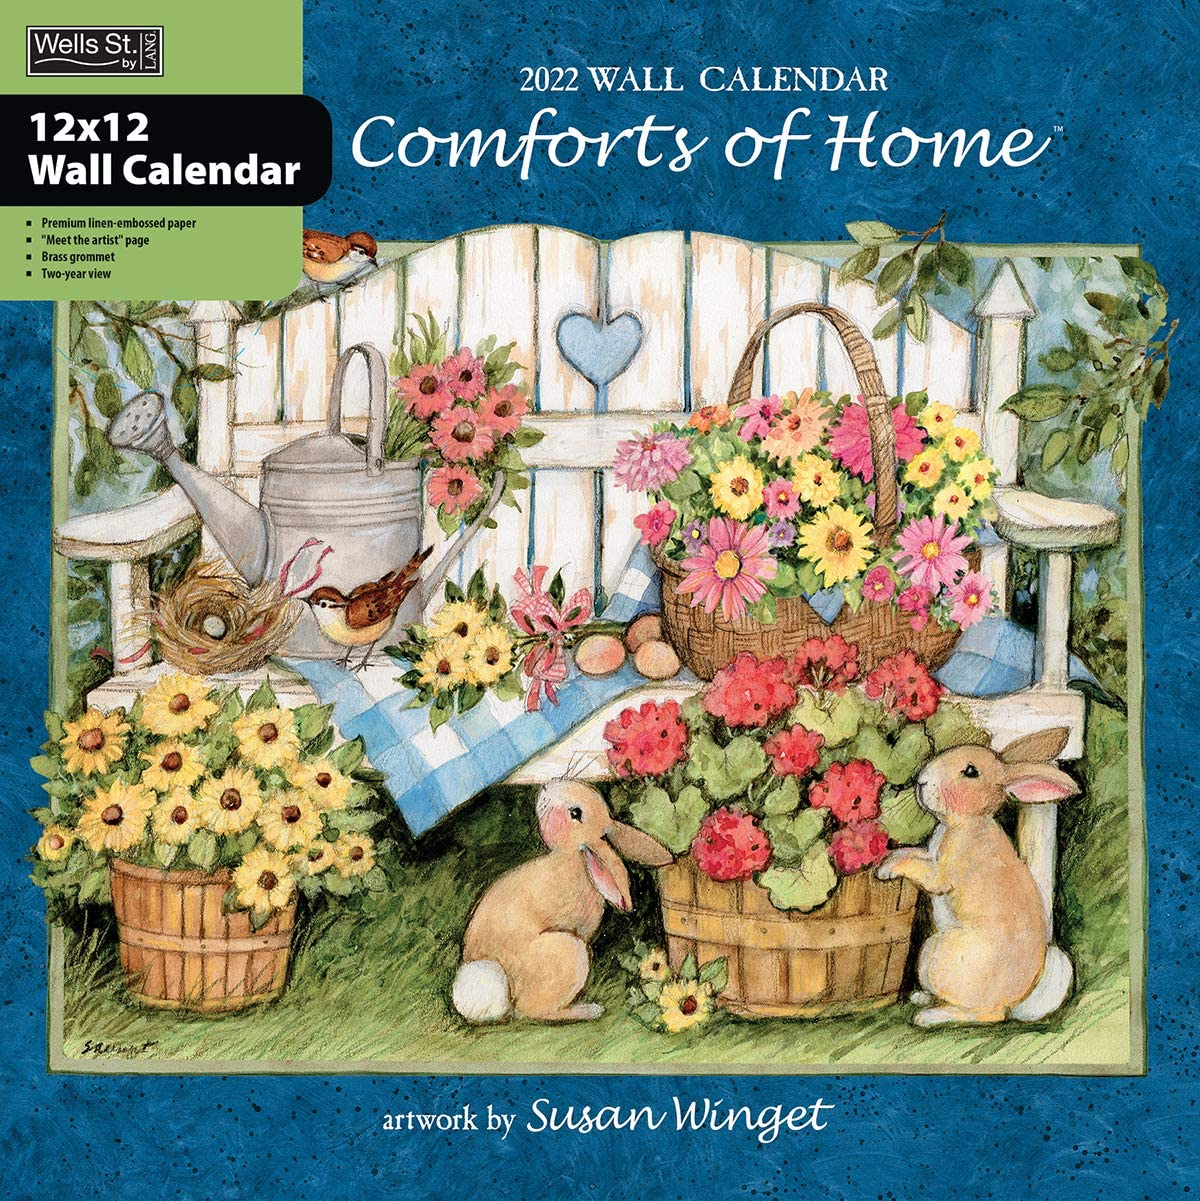 WSBL Comforts of Home 2022 12X12 Wall Calendar (22997001724)